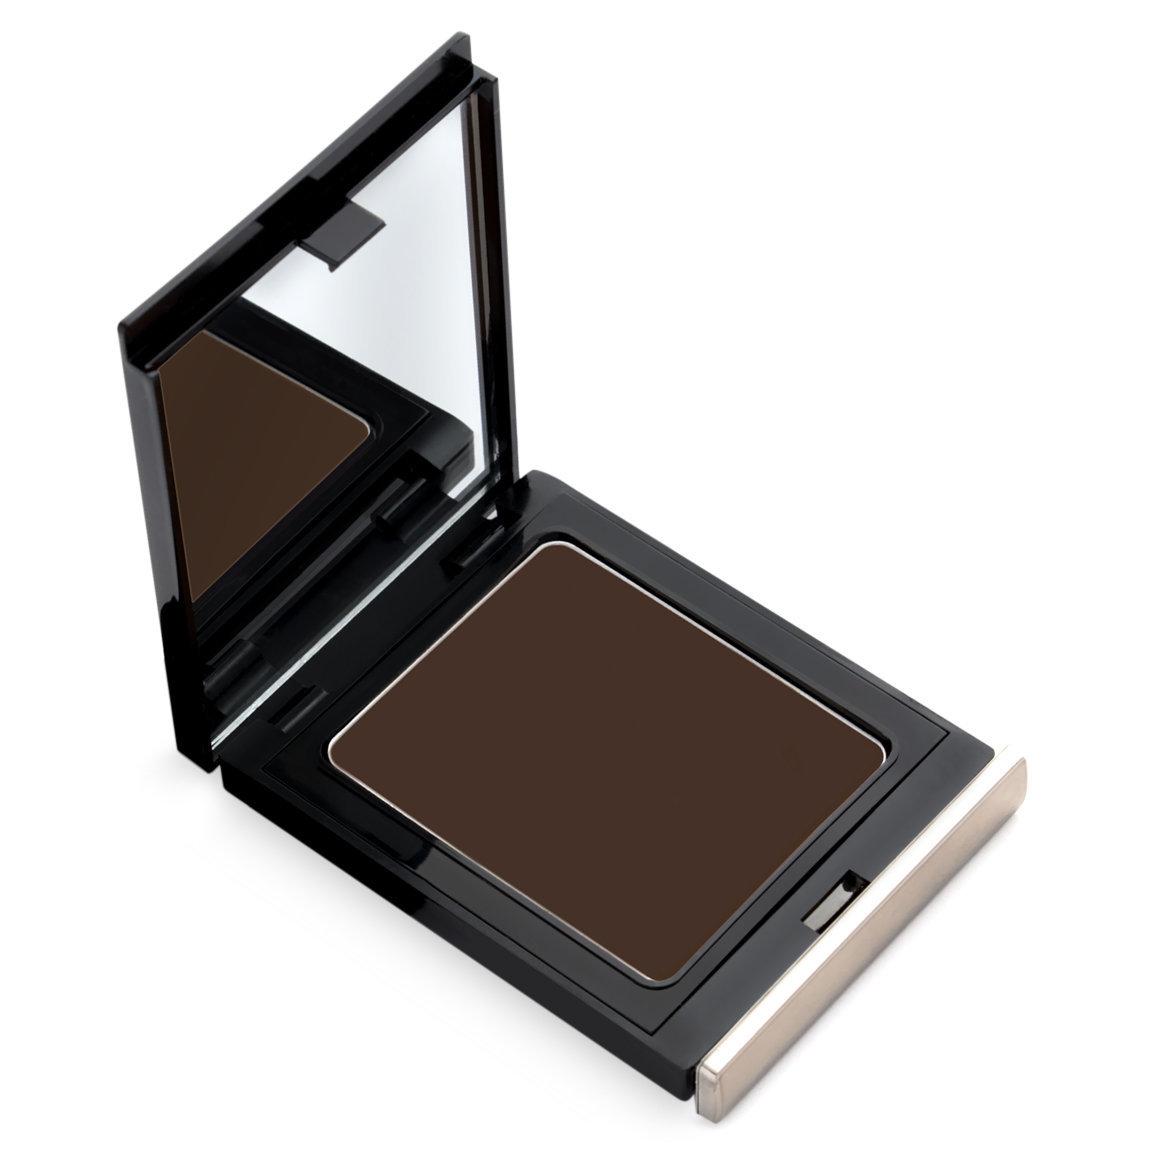 Danessa Myricks Beauty Balm Contour Deep 1 alternative view 1 - product swatch.